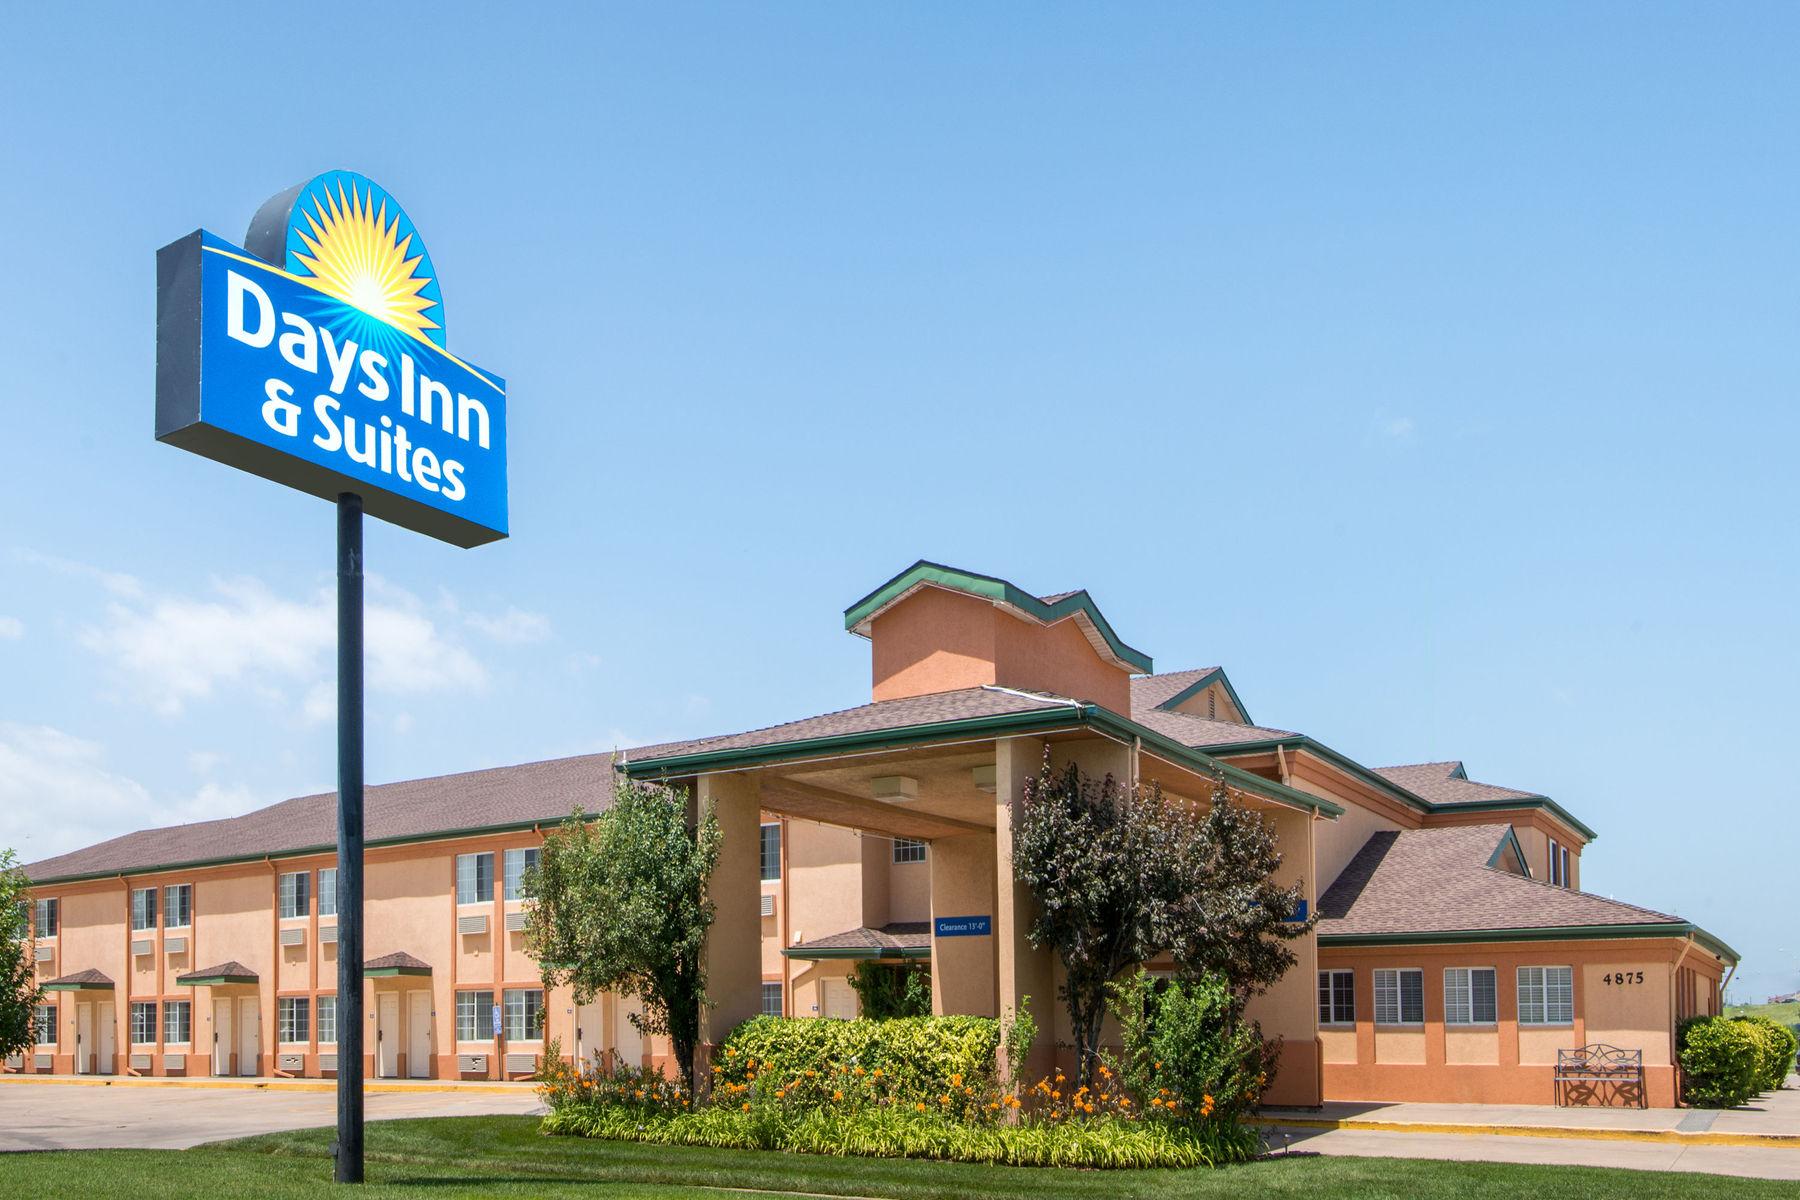 Days Inn & Suites | Wichita, KS